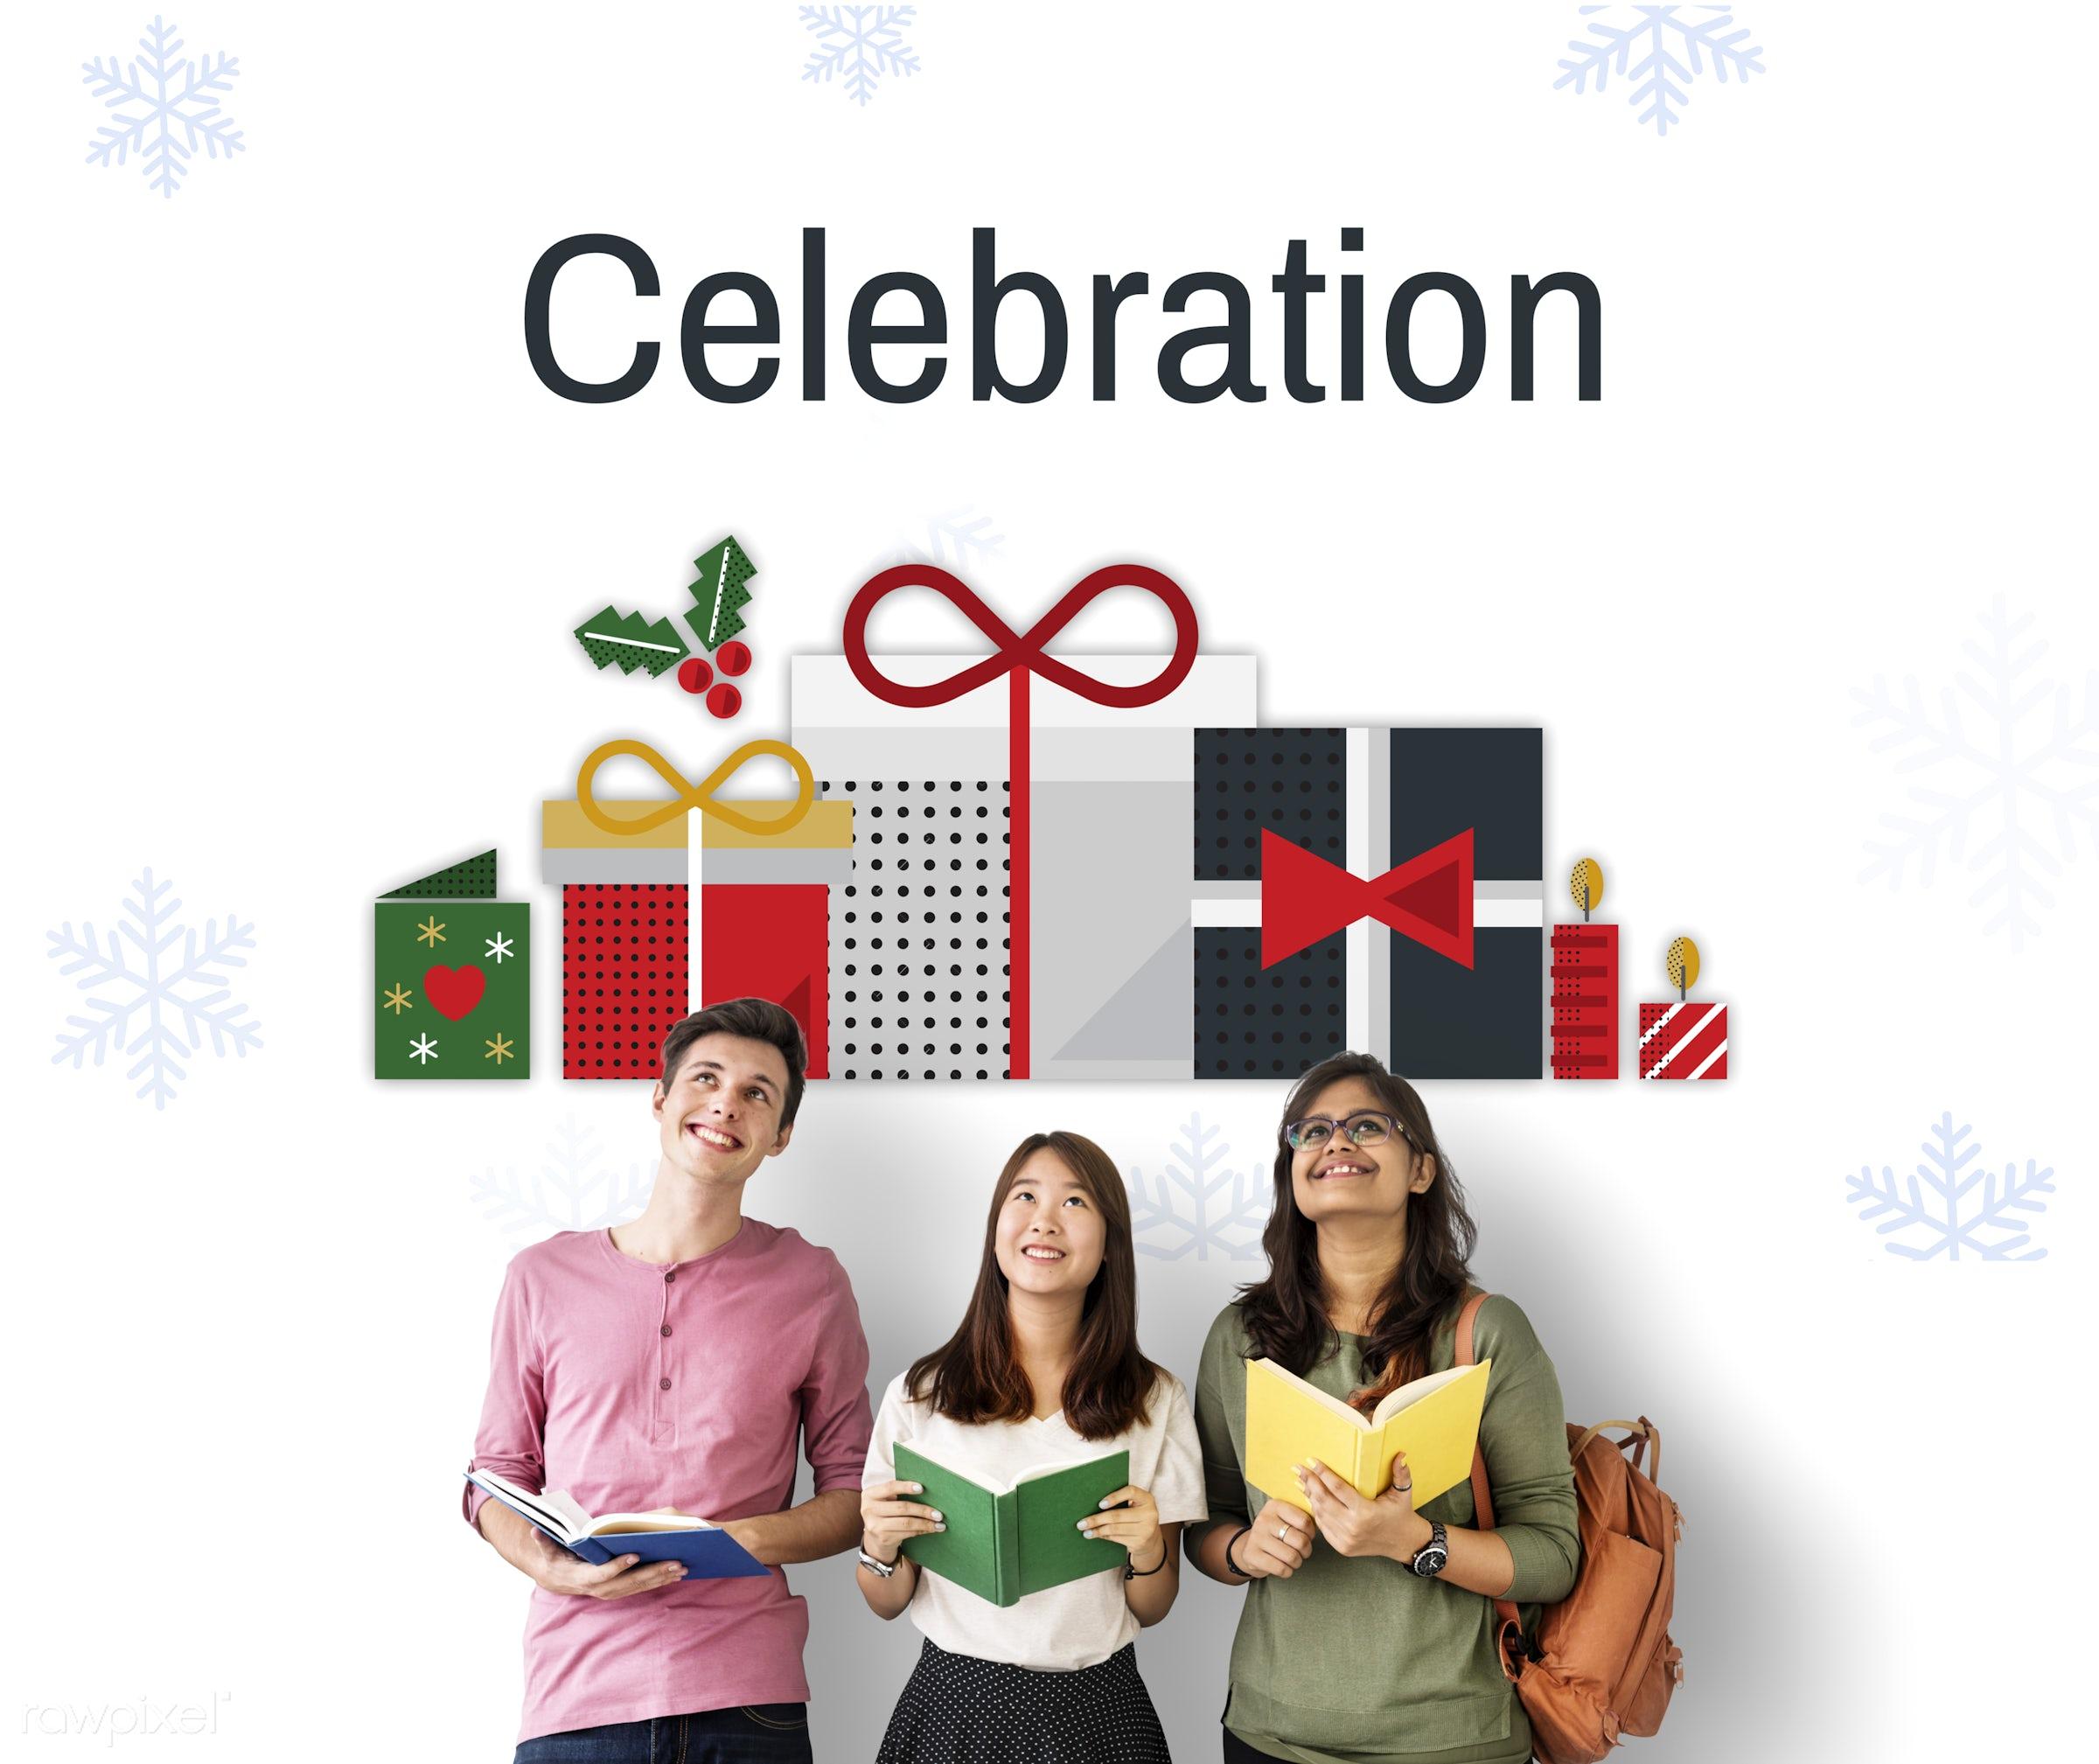 african descent, asian, best wishes, book, caucasian, celebration, christmas, confetti, decoration, diversity, enjoyment,...